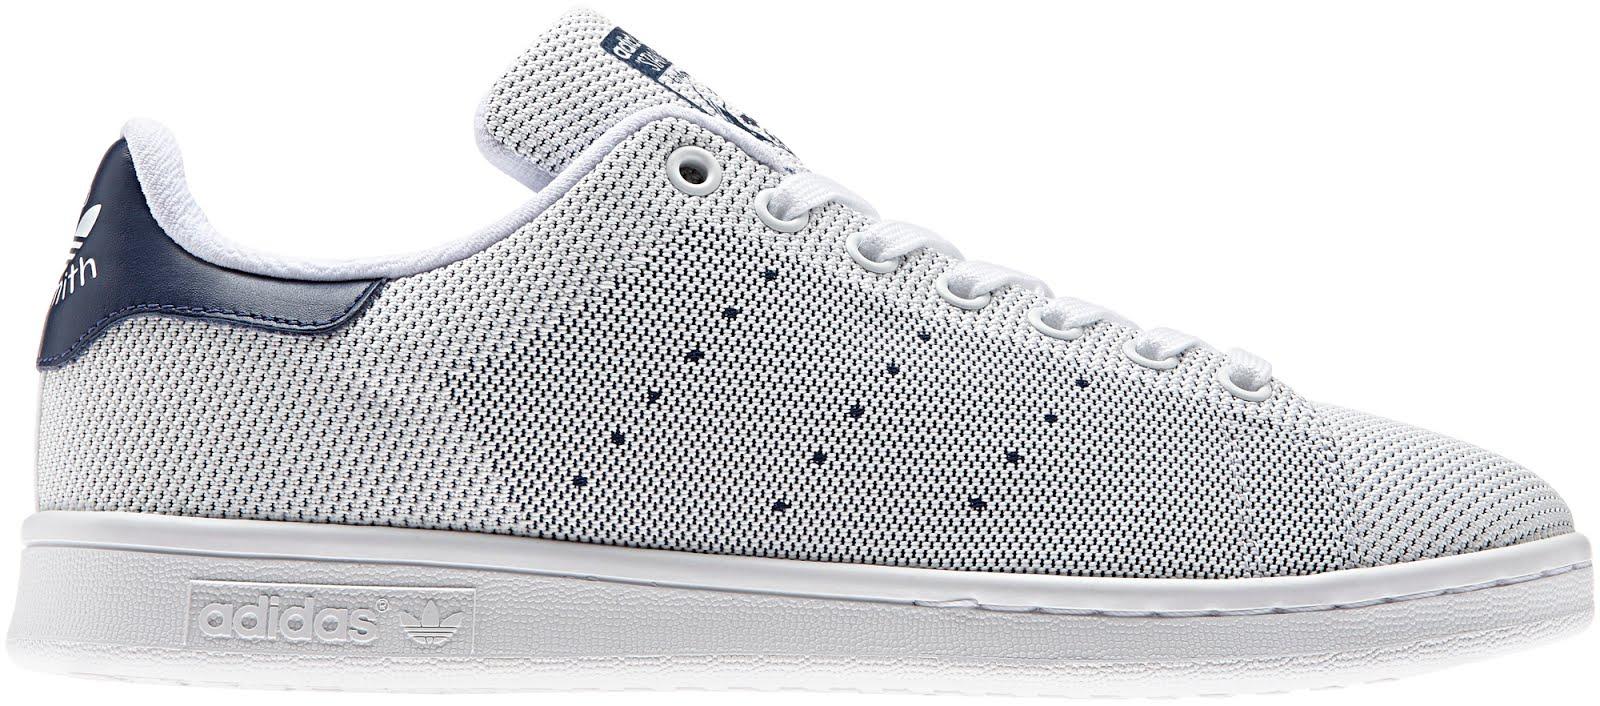 new style 39b8d b3b53 Adidas Originals - Stan Smith